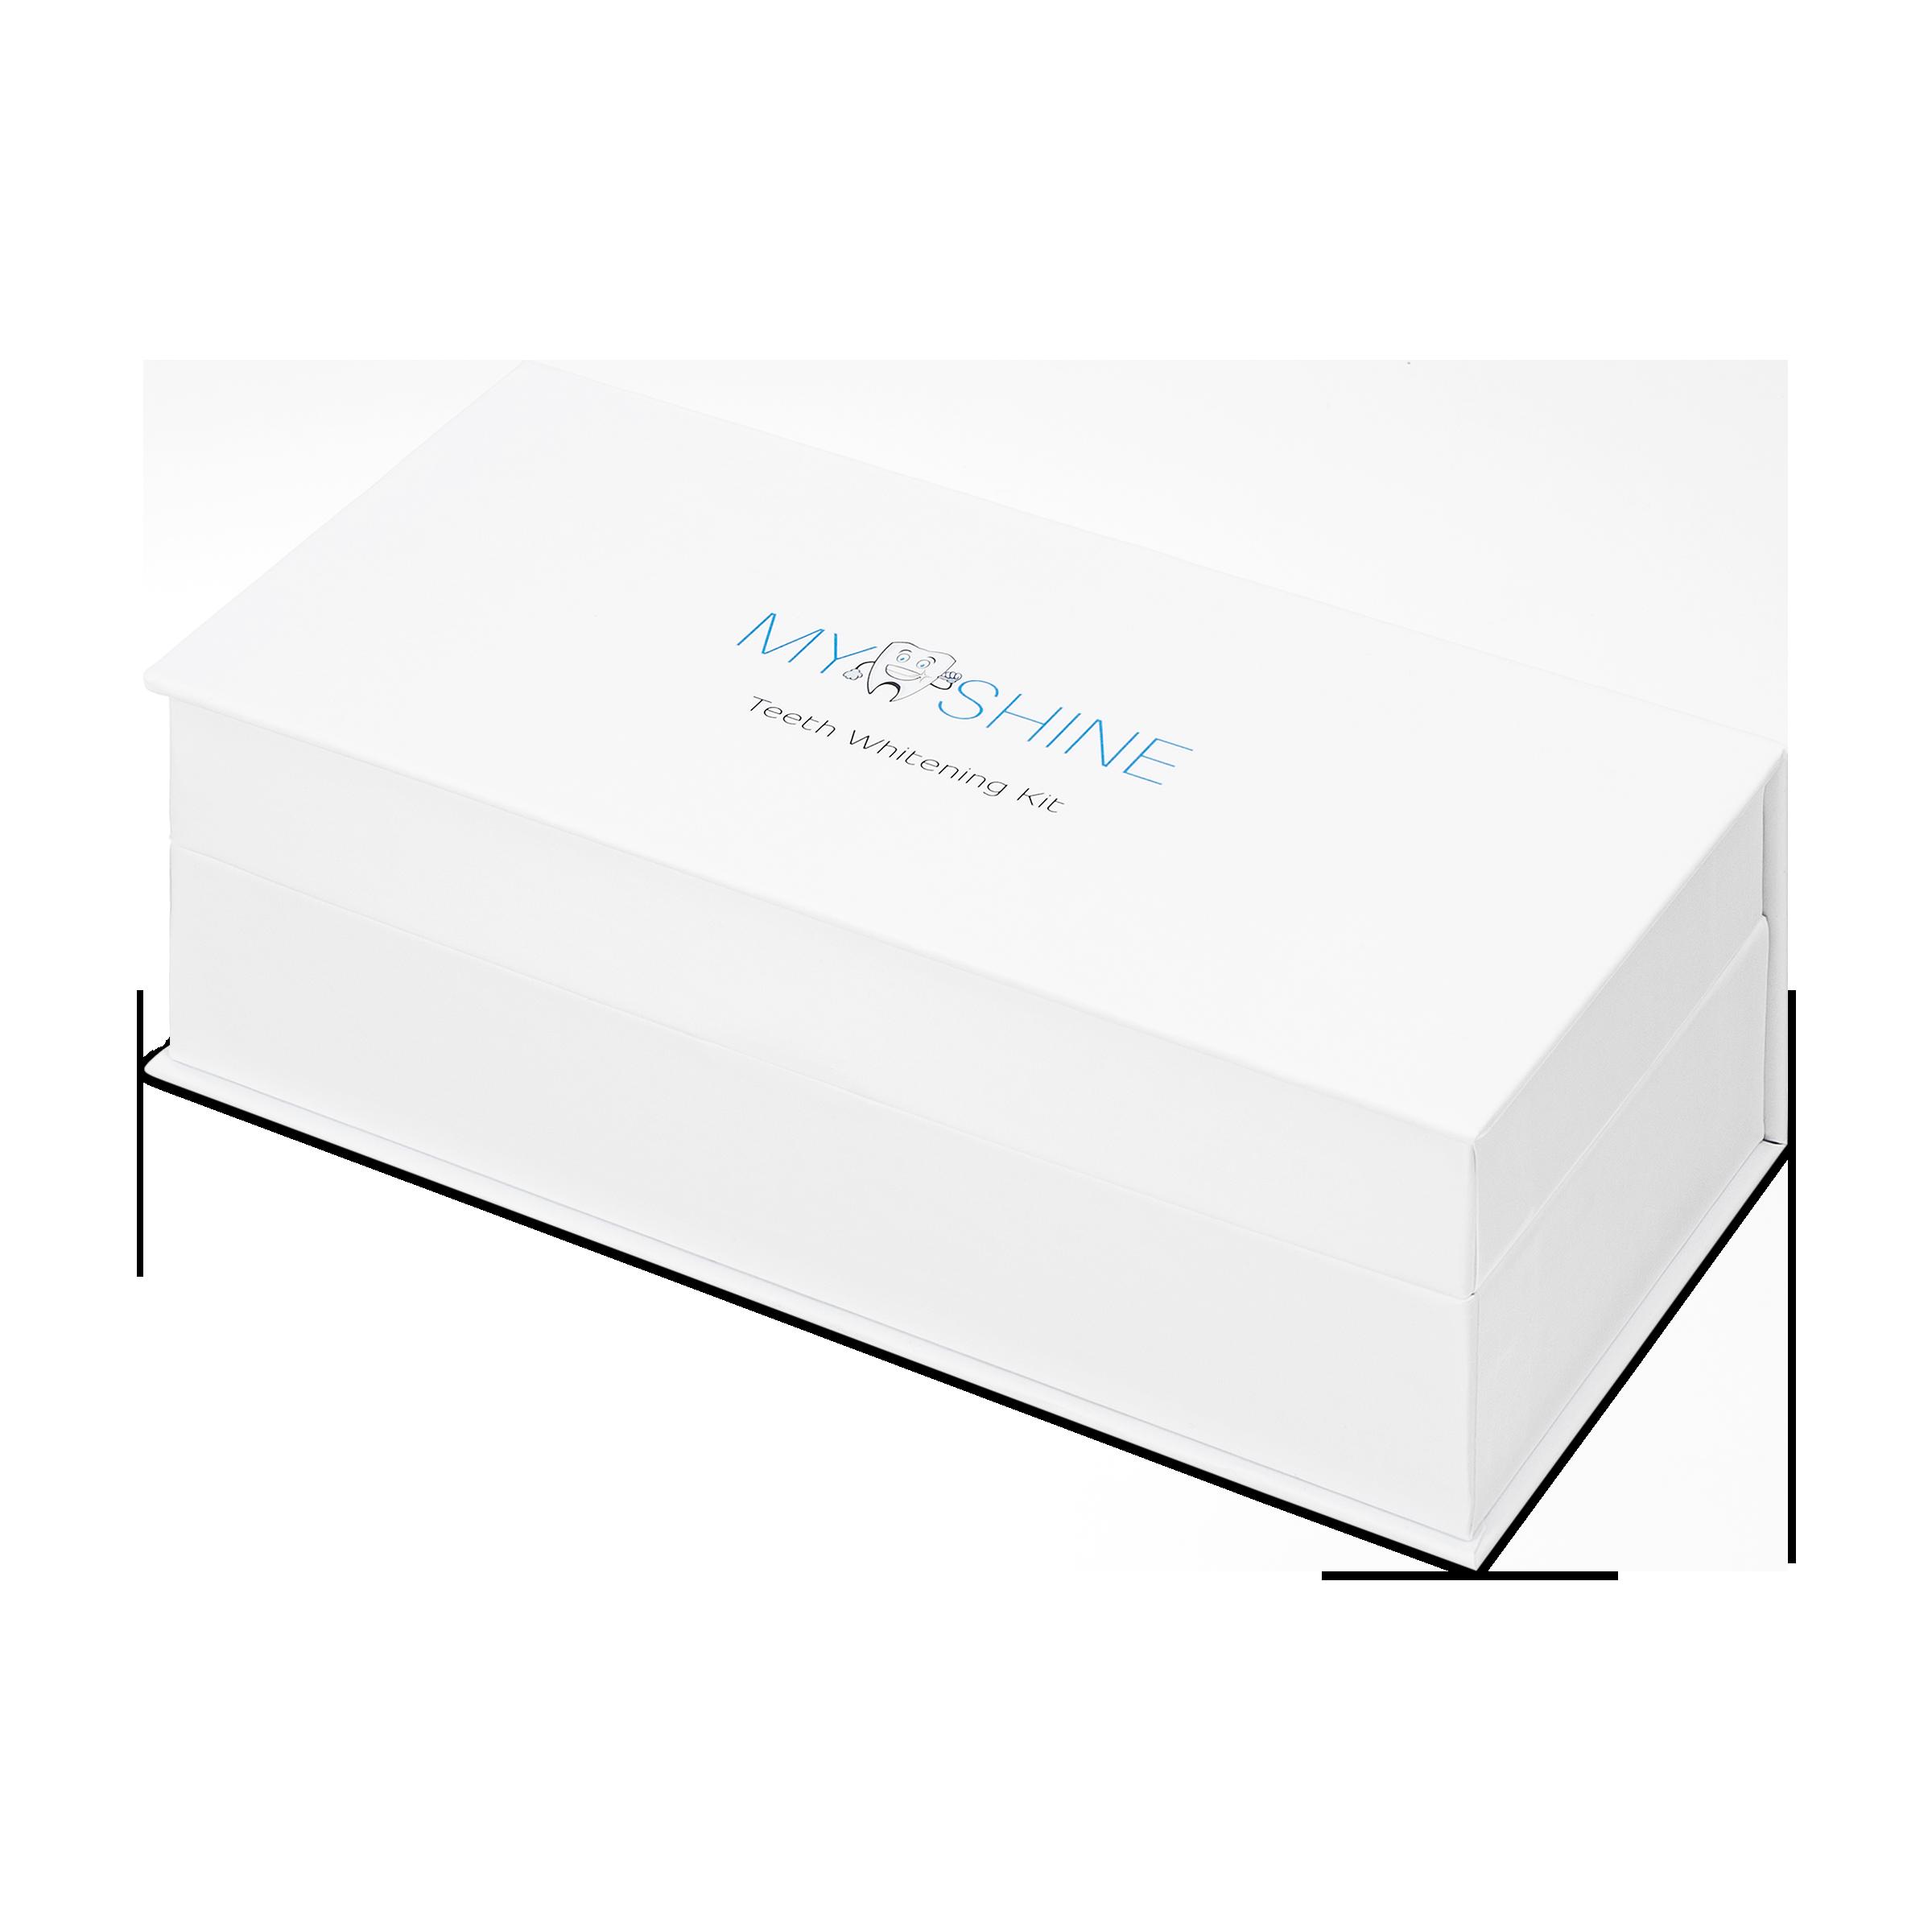 teeth whitening kit product photography